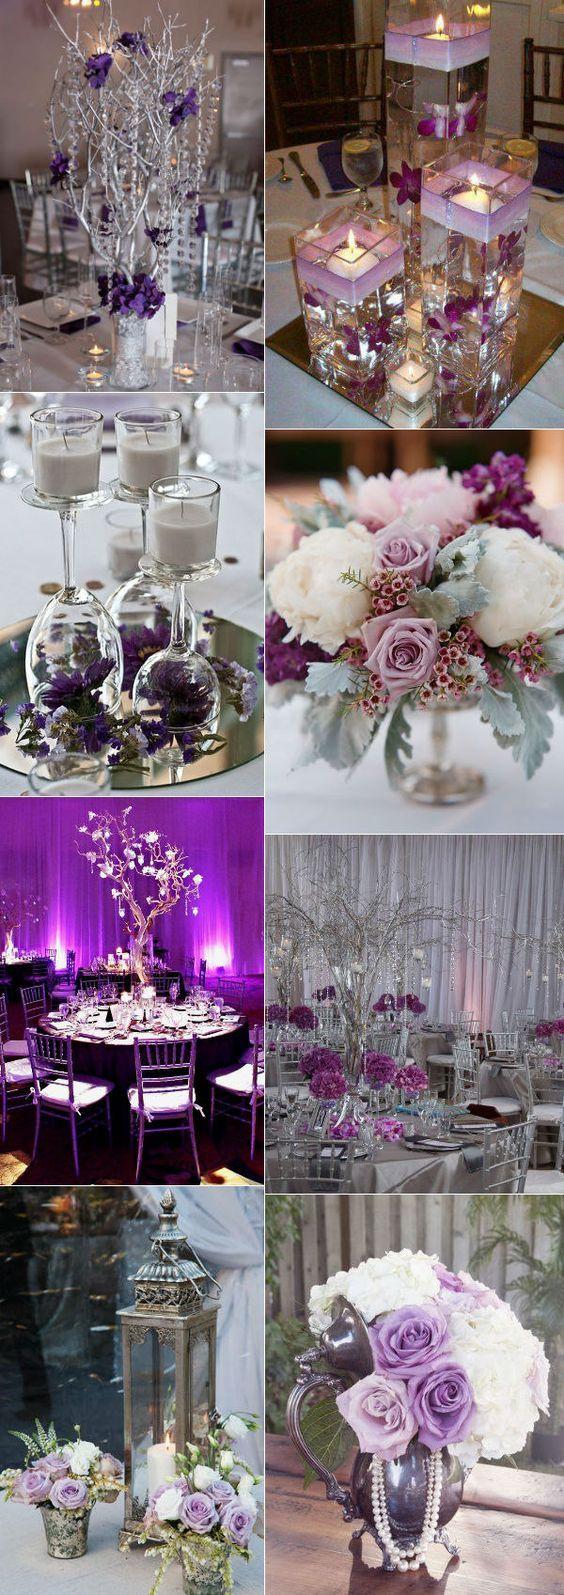 Best plum wedding centerpieces ideas on pinterest